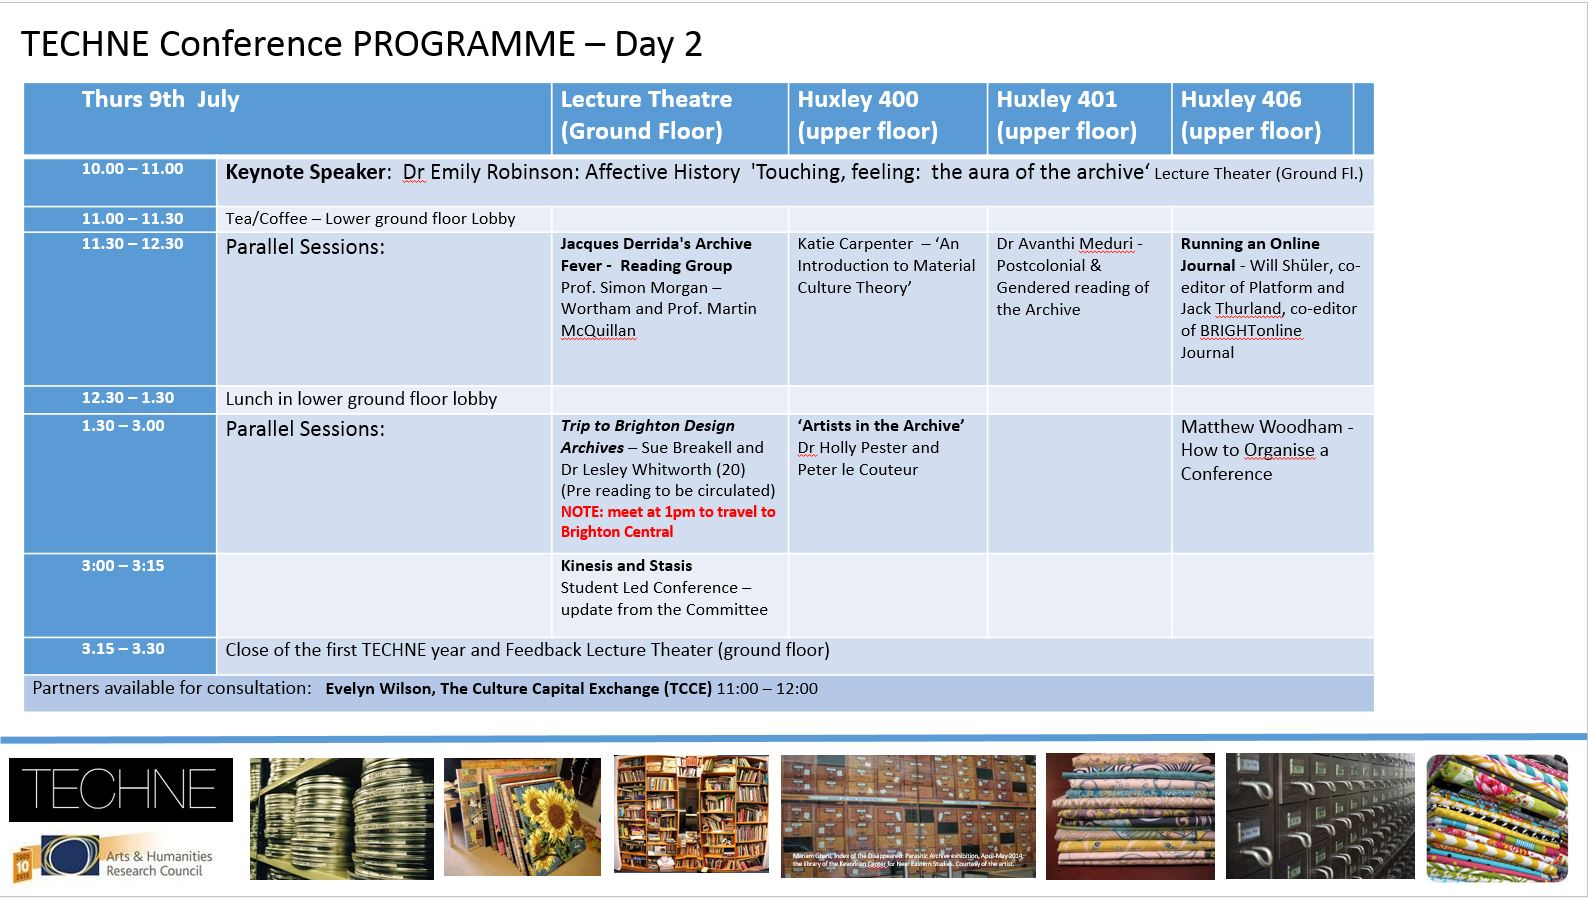 TECHNE-Congress-July-2015-Day-2-Programme